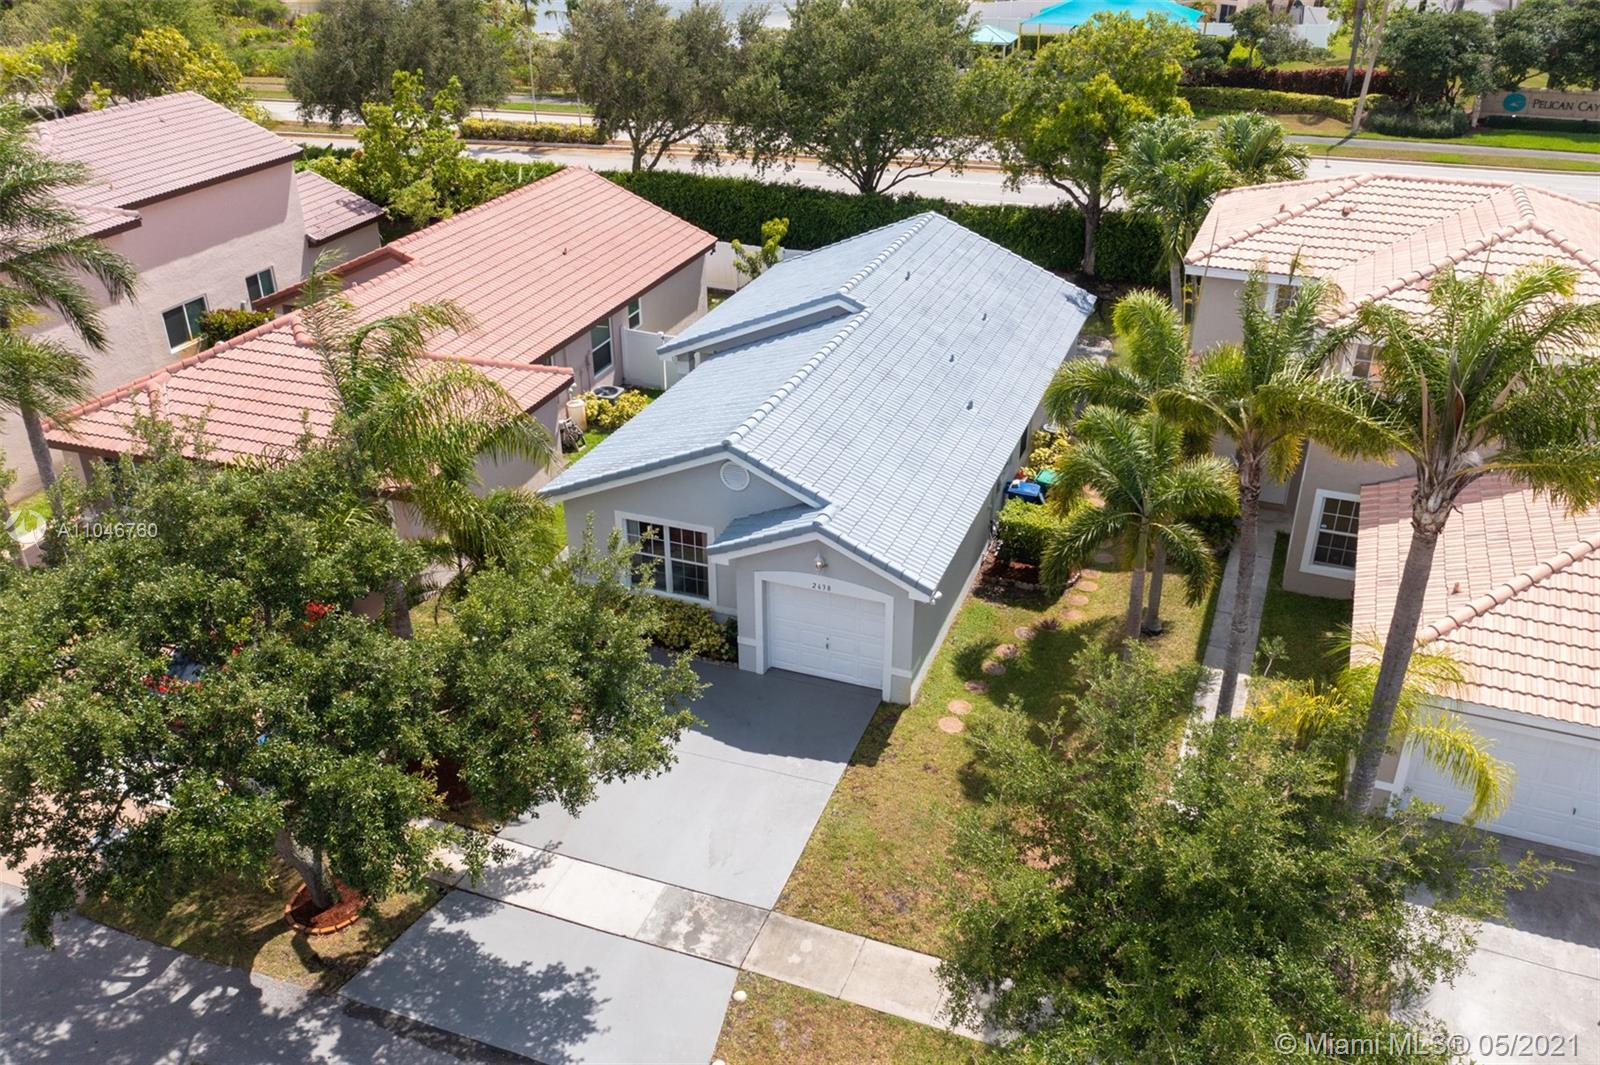 Silver Lakes - 2638 SW 177th Ave, Miramar, FL 33029